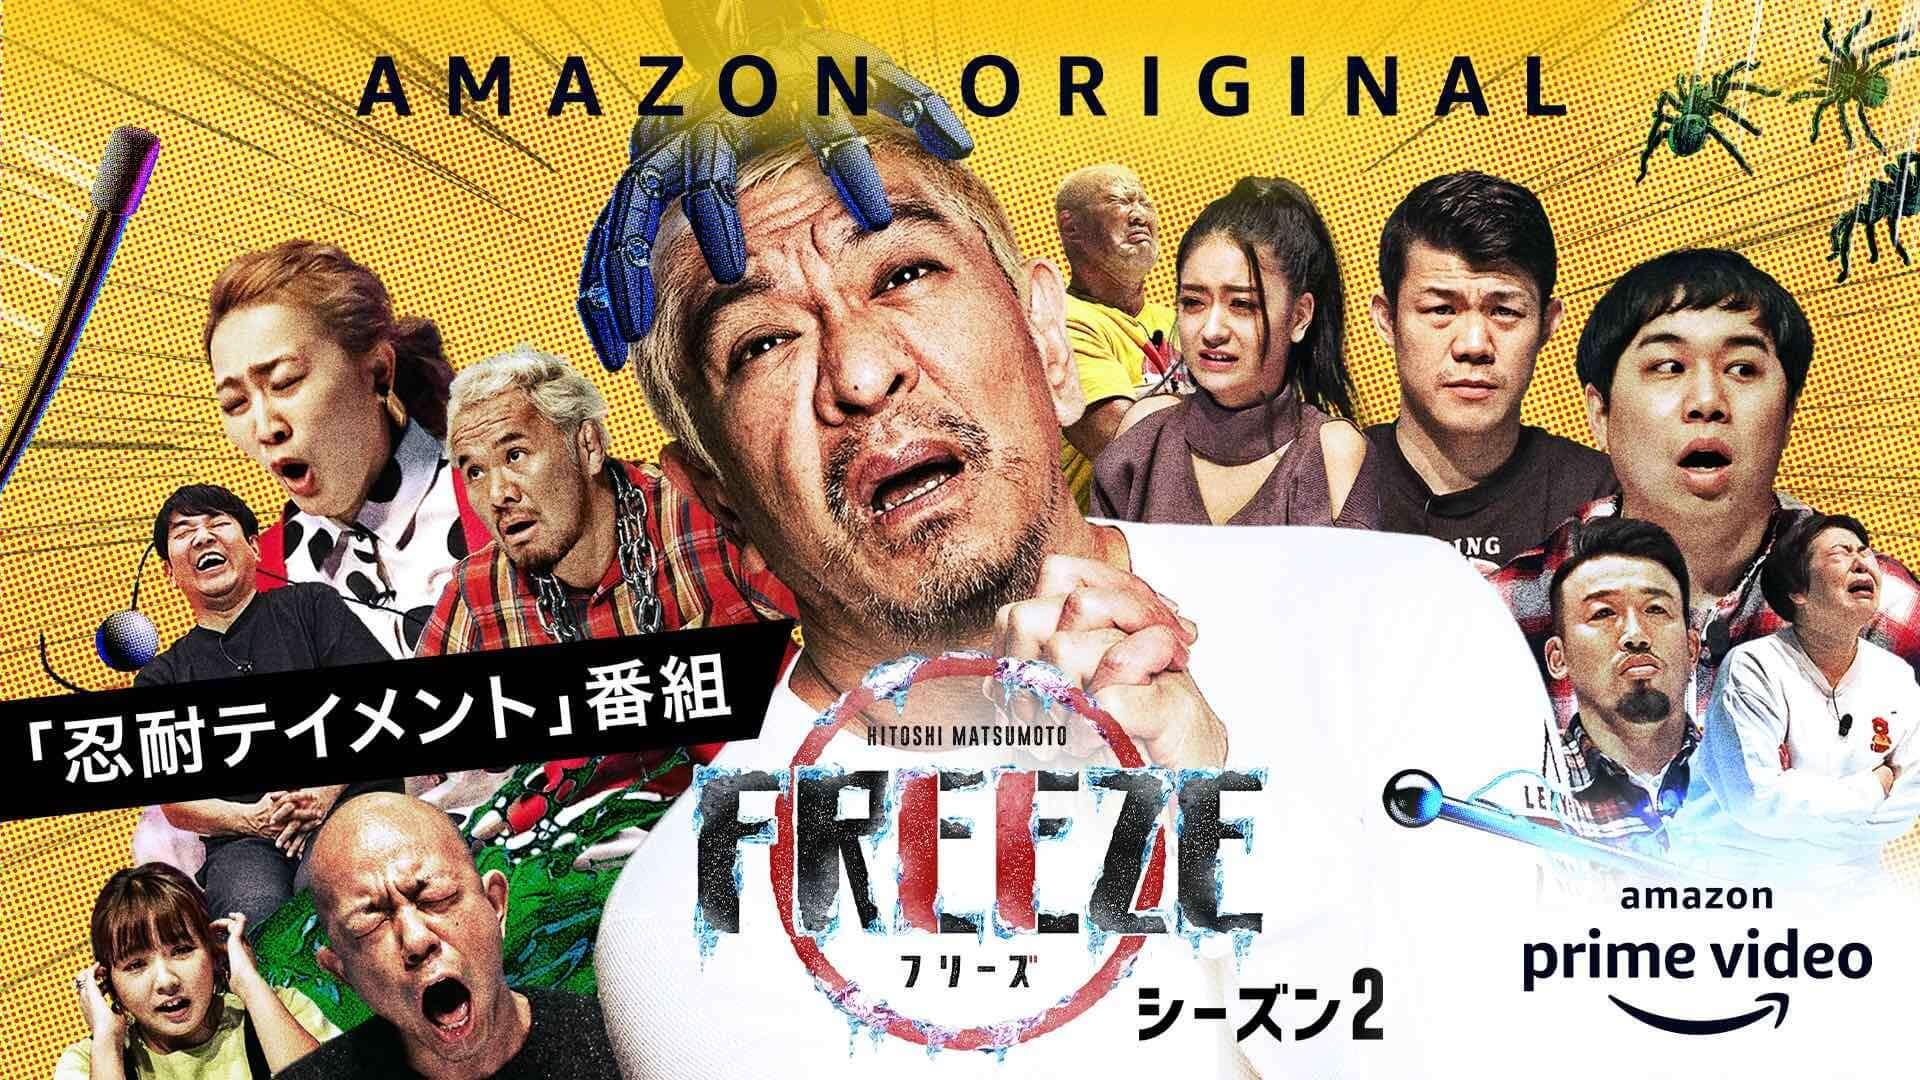 Amazon Prime Videoに『キングダム』、松本人志『FREEZE』新作など続々登場!DREAMS COME TRUE映像作品など7月の新着コンテンツが解禁 film200630_amazonprime_3-1920x1080